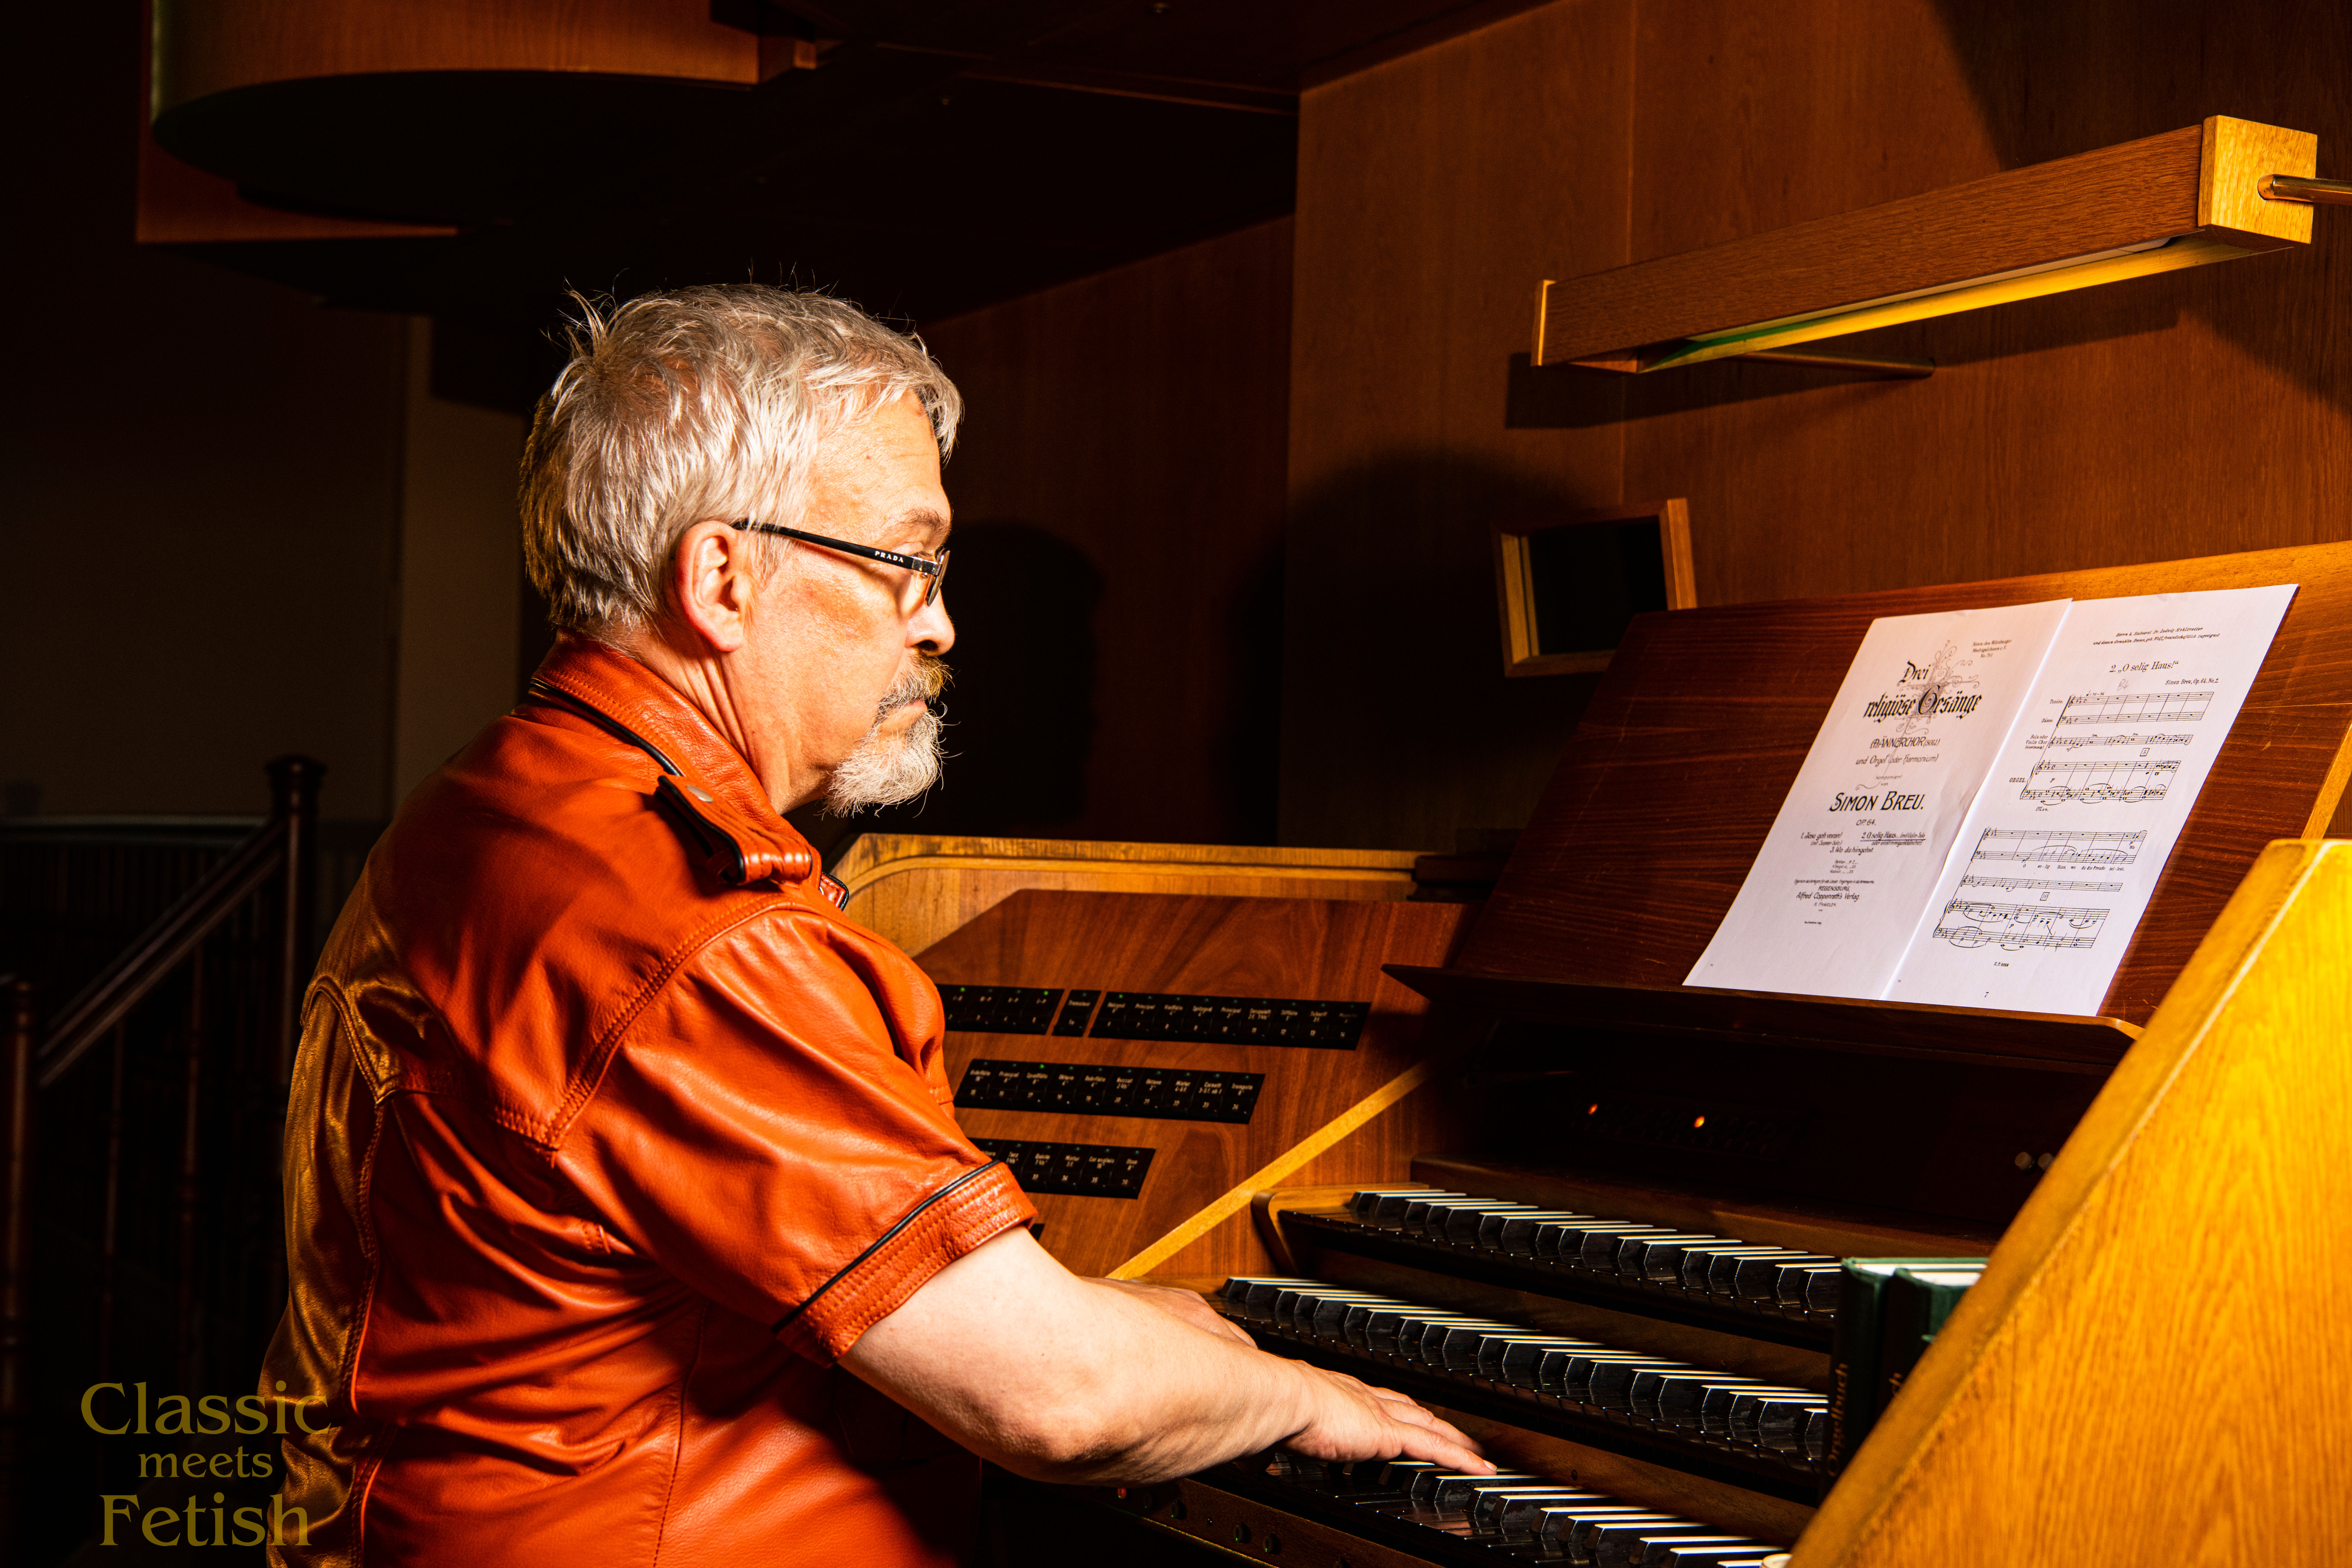 Martin L. Carl, Orgel & Cembalo / Organ & harpischord